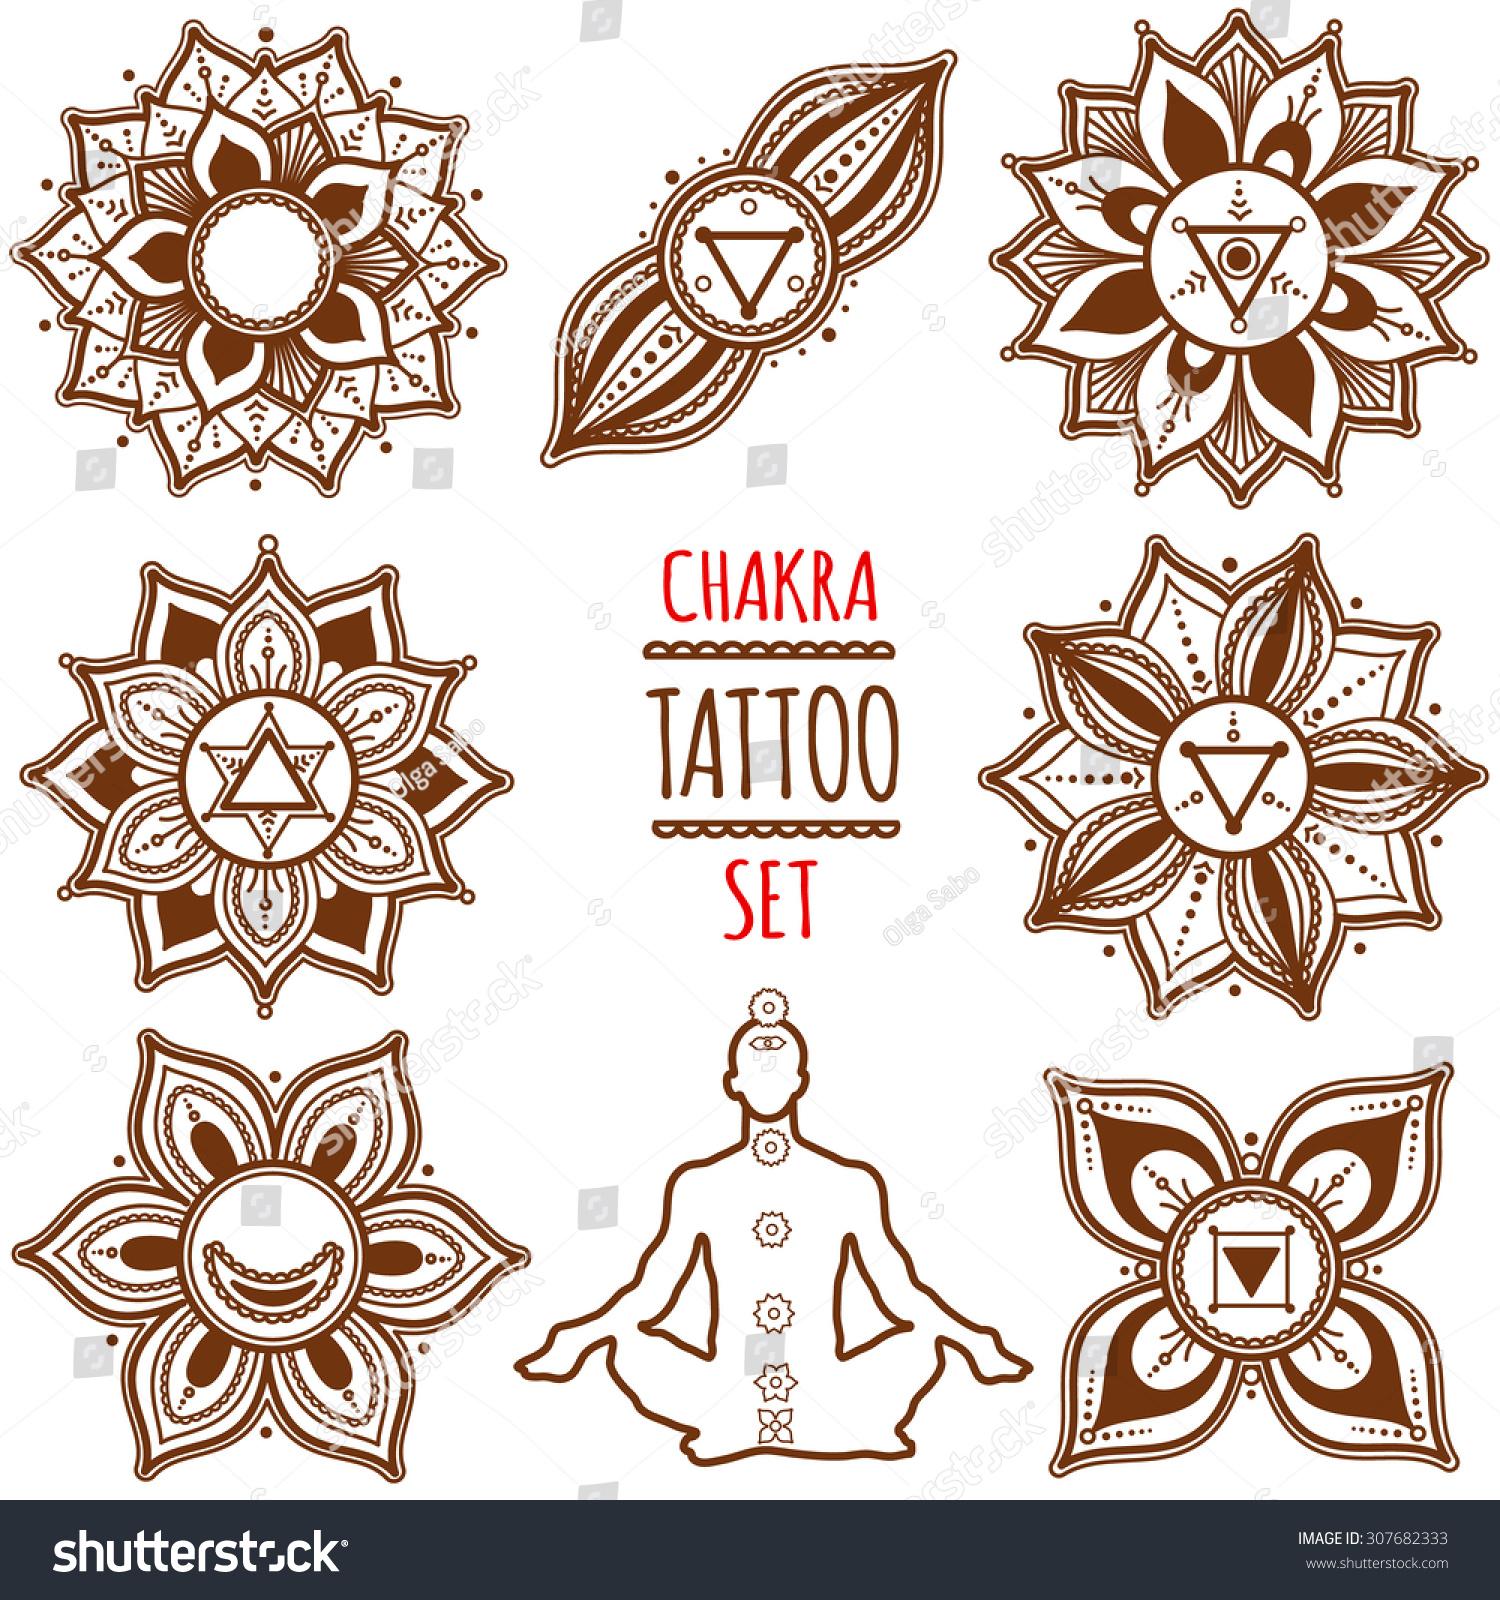 Chakra Set Henna Tattoo Mehndi Style Stock Vector Royalty Free